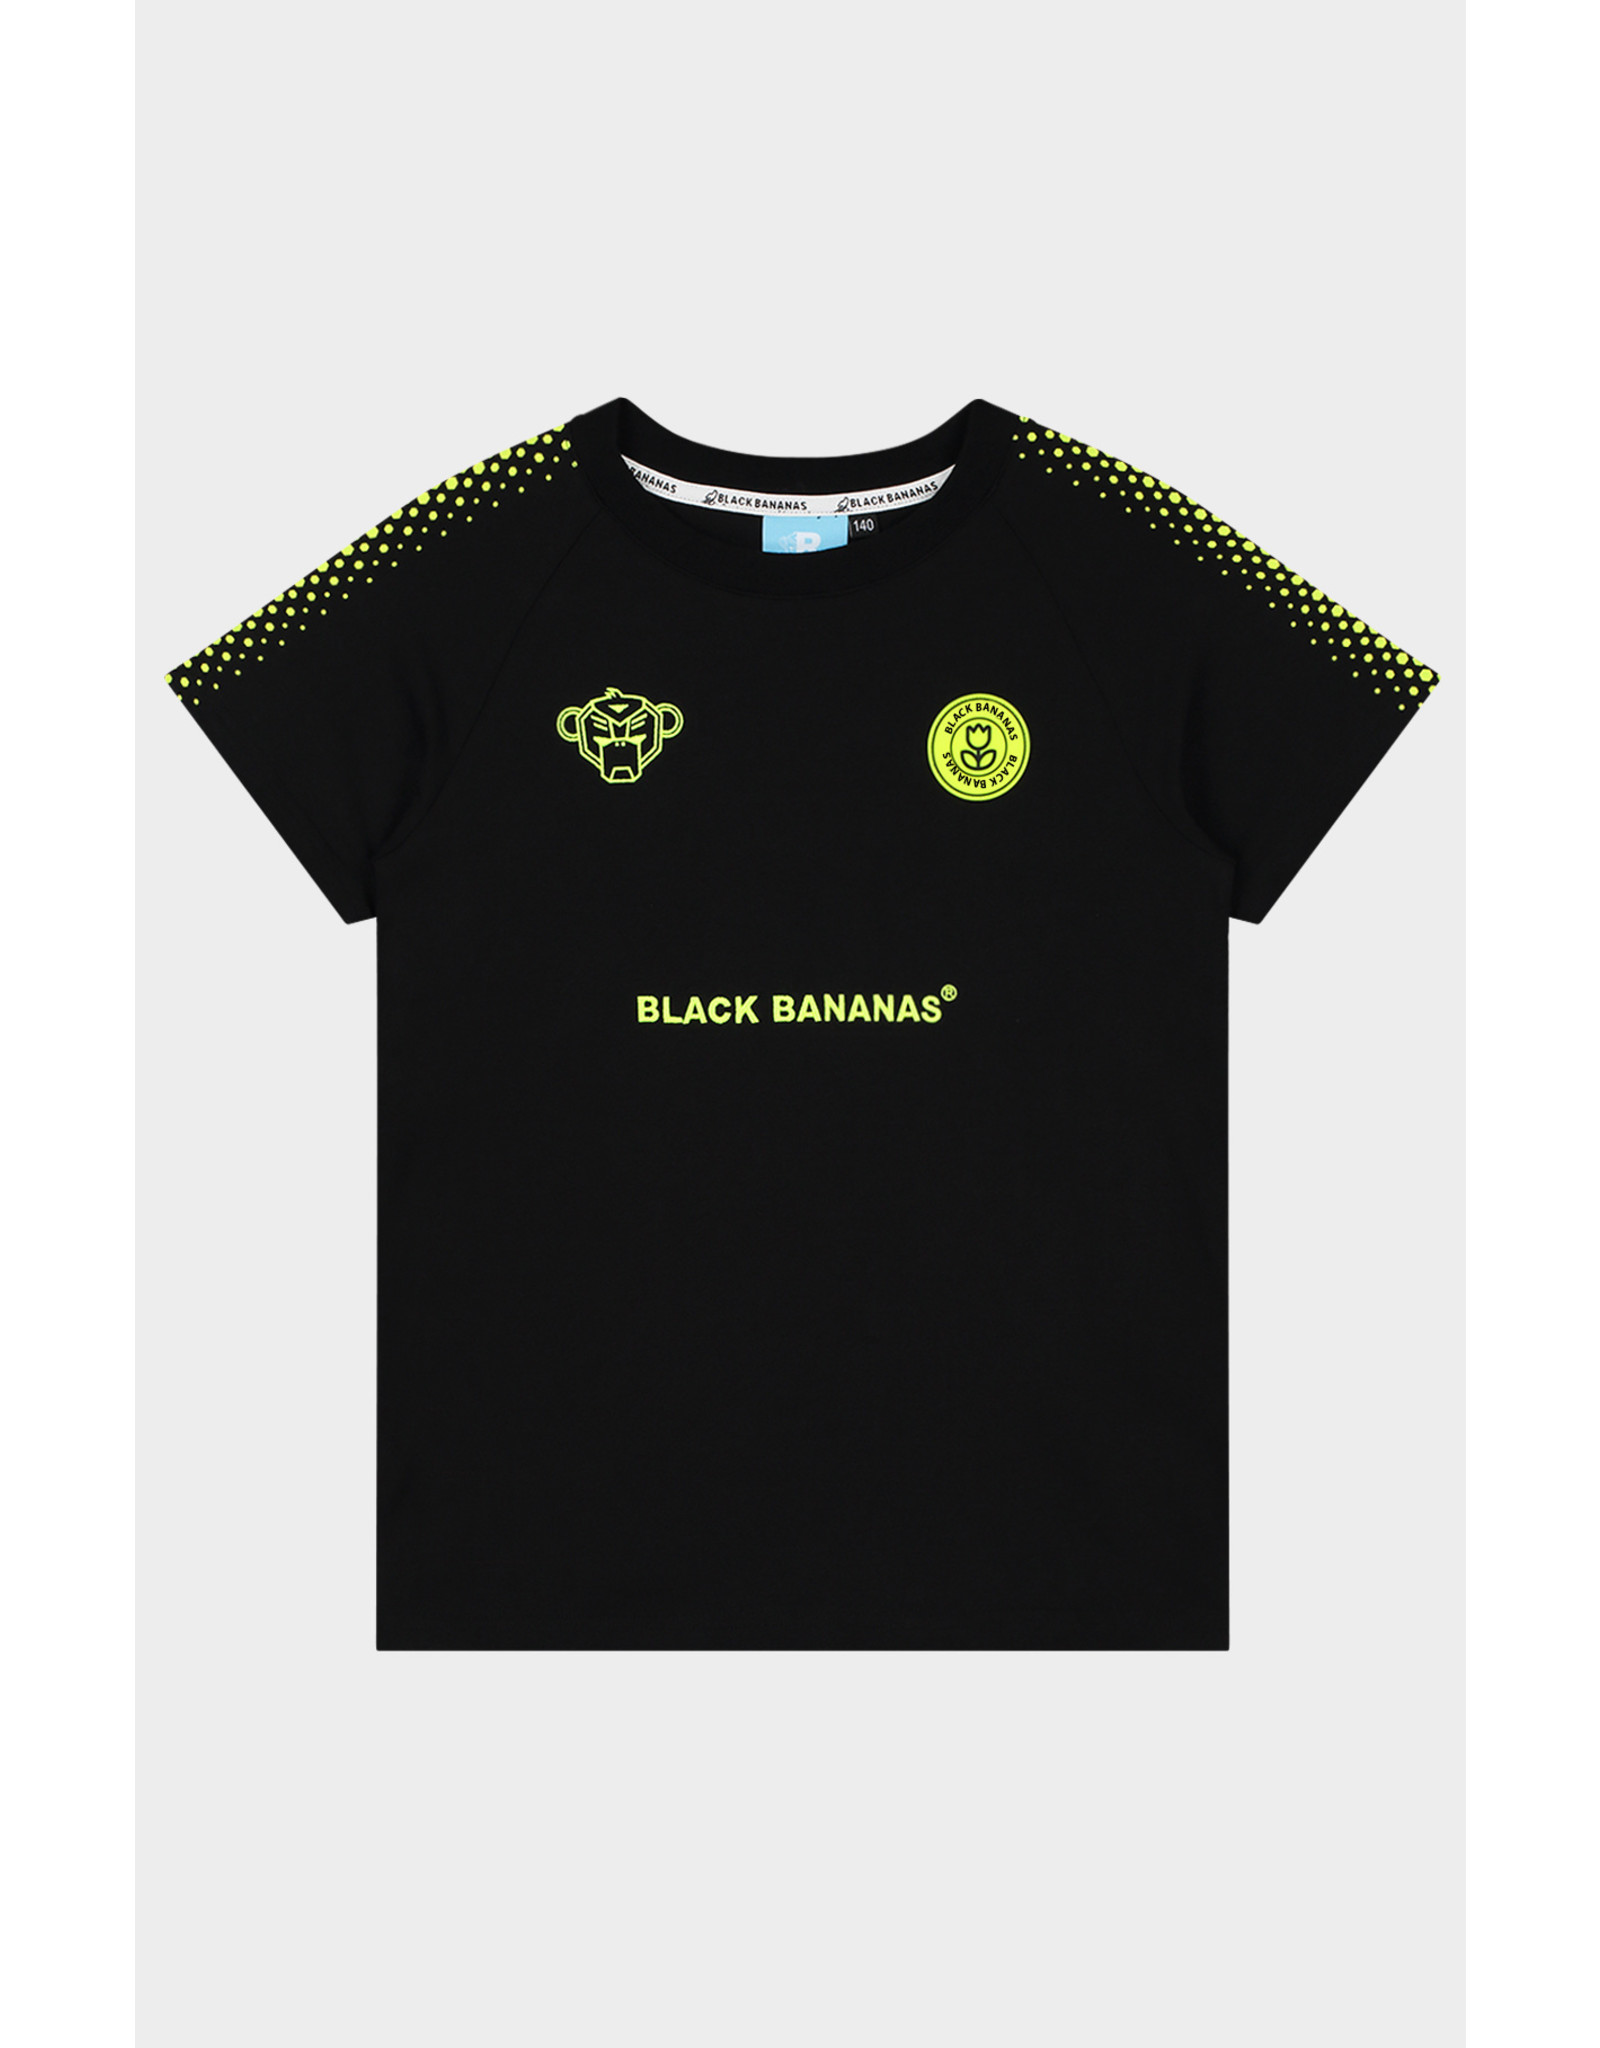 Black Bananas Jr. Hexagon Tee Black/neon yellow